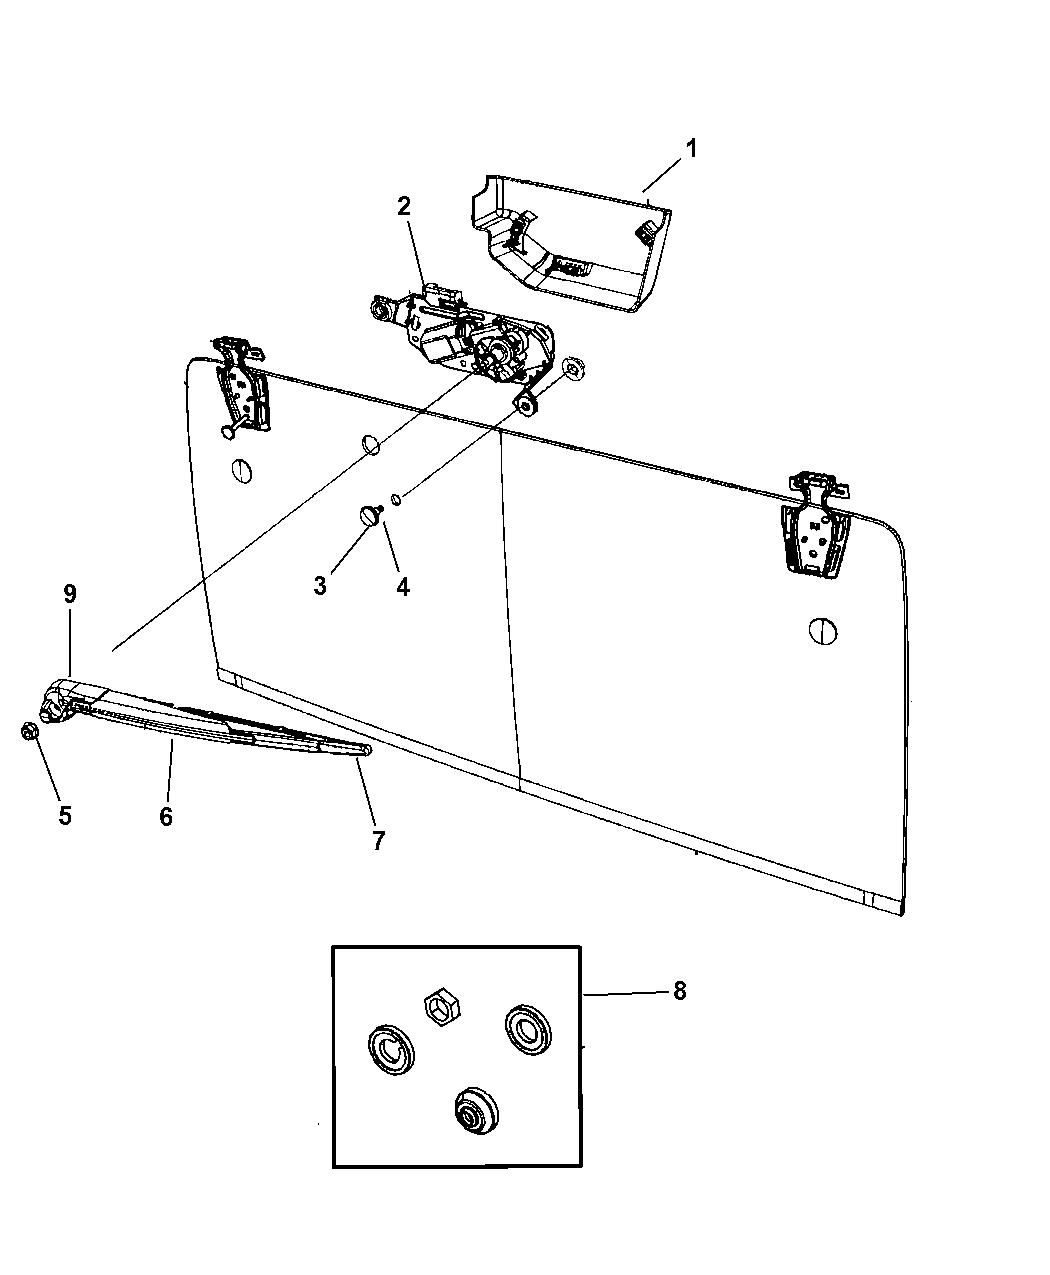 Jeep Wrangler Rear Wiper System